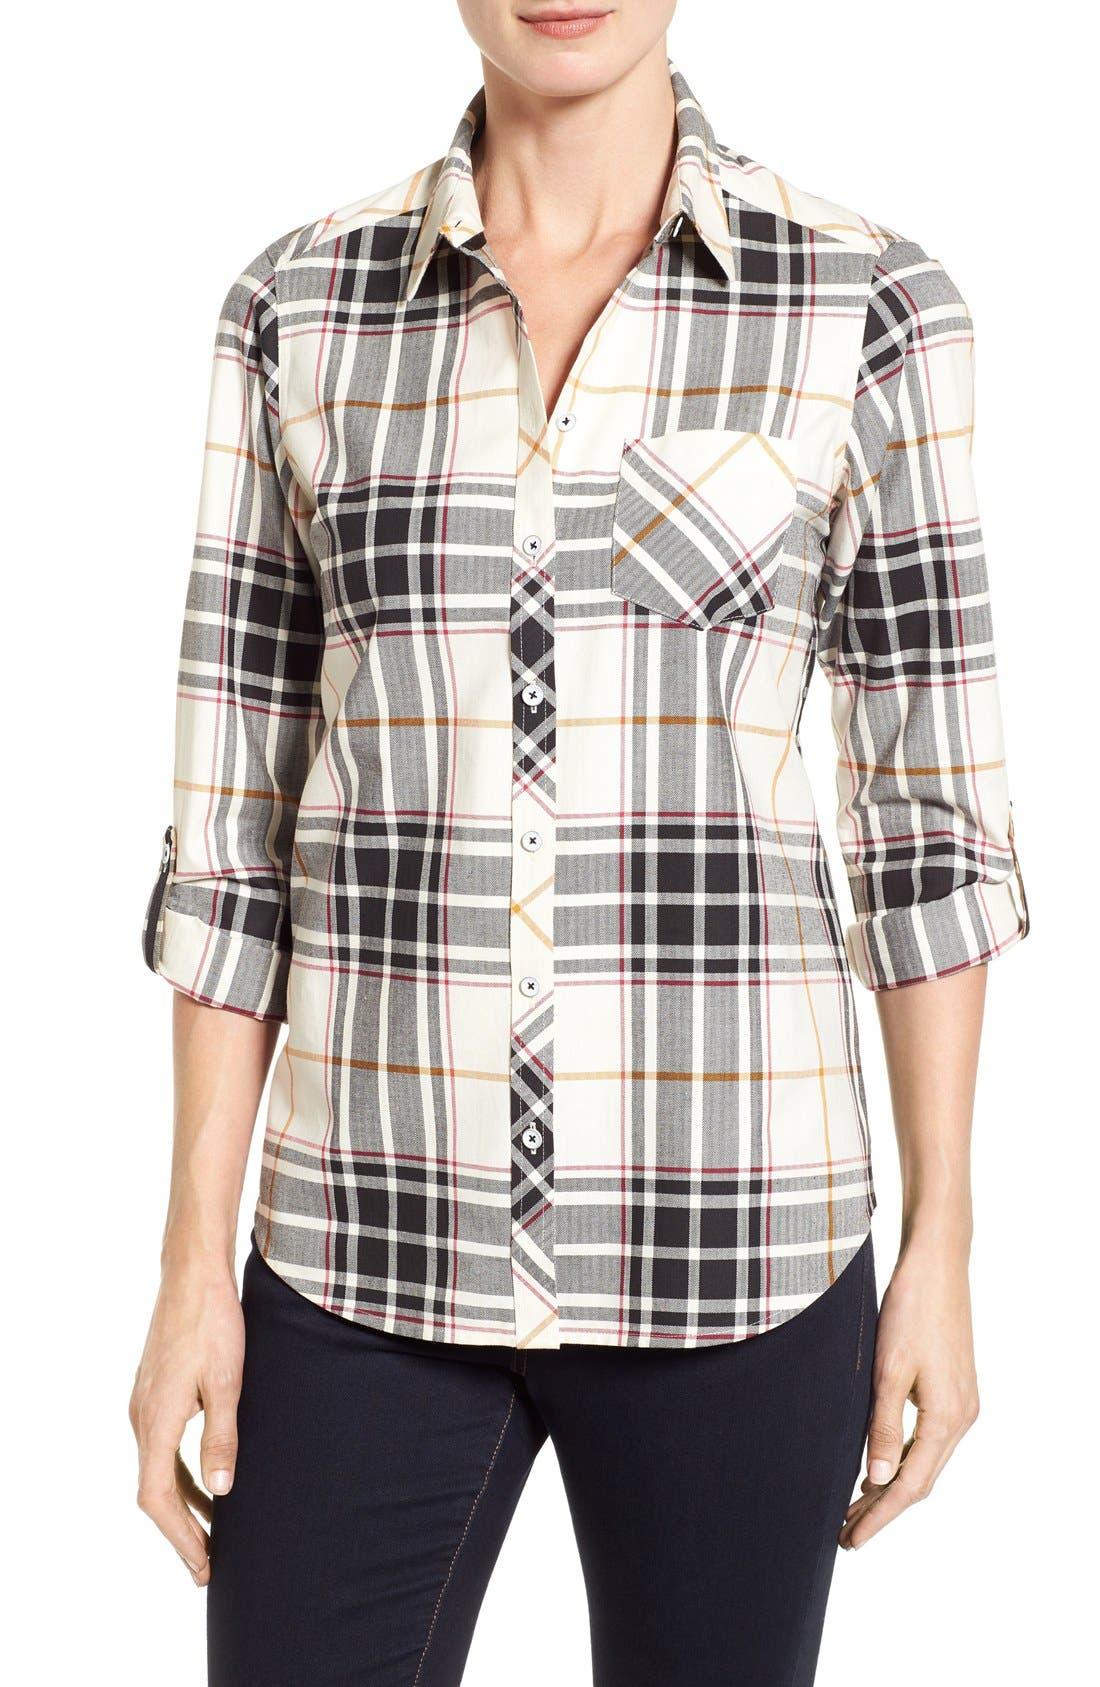 Alternate Image 1 Selected - Foxcroft Herringbone Plaid Roll Sleeve Shirt (Regular & Petite)